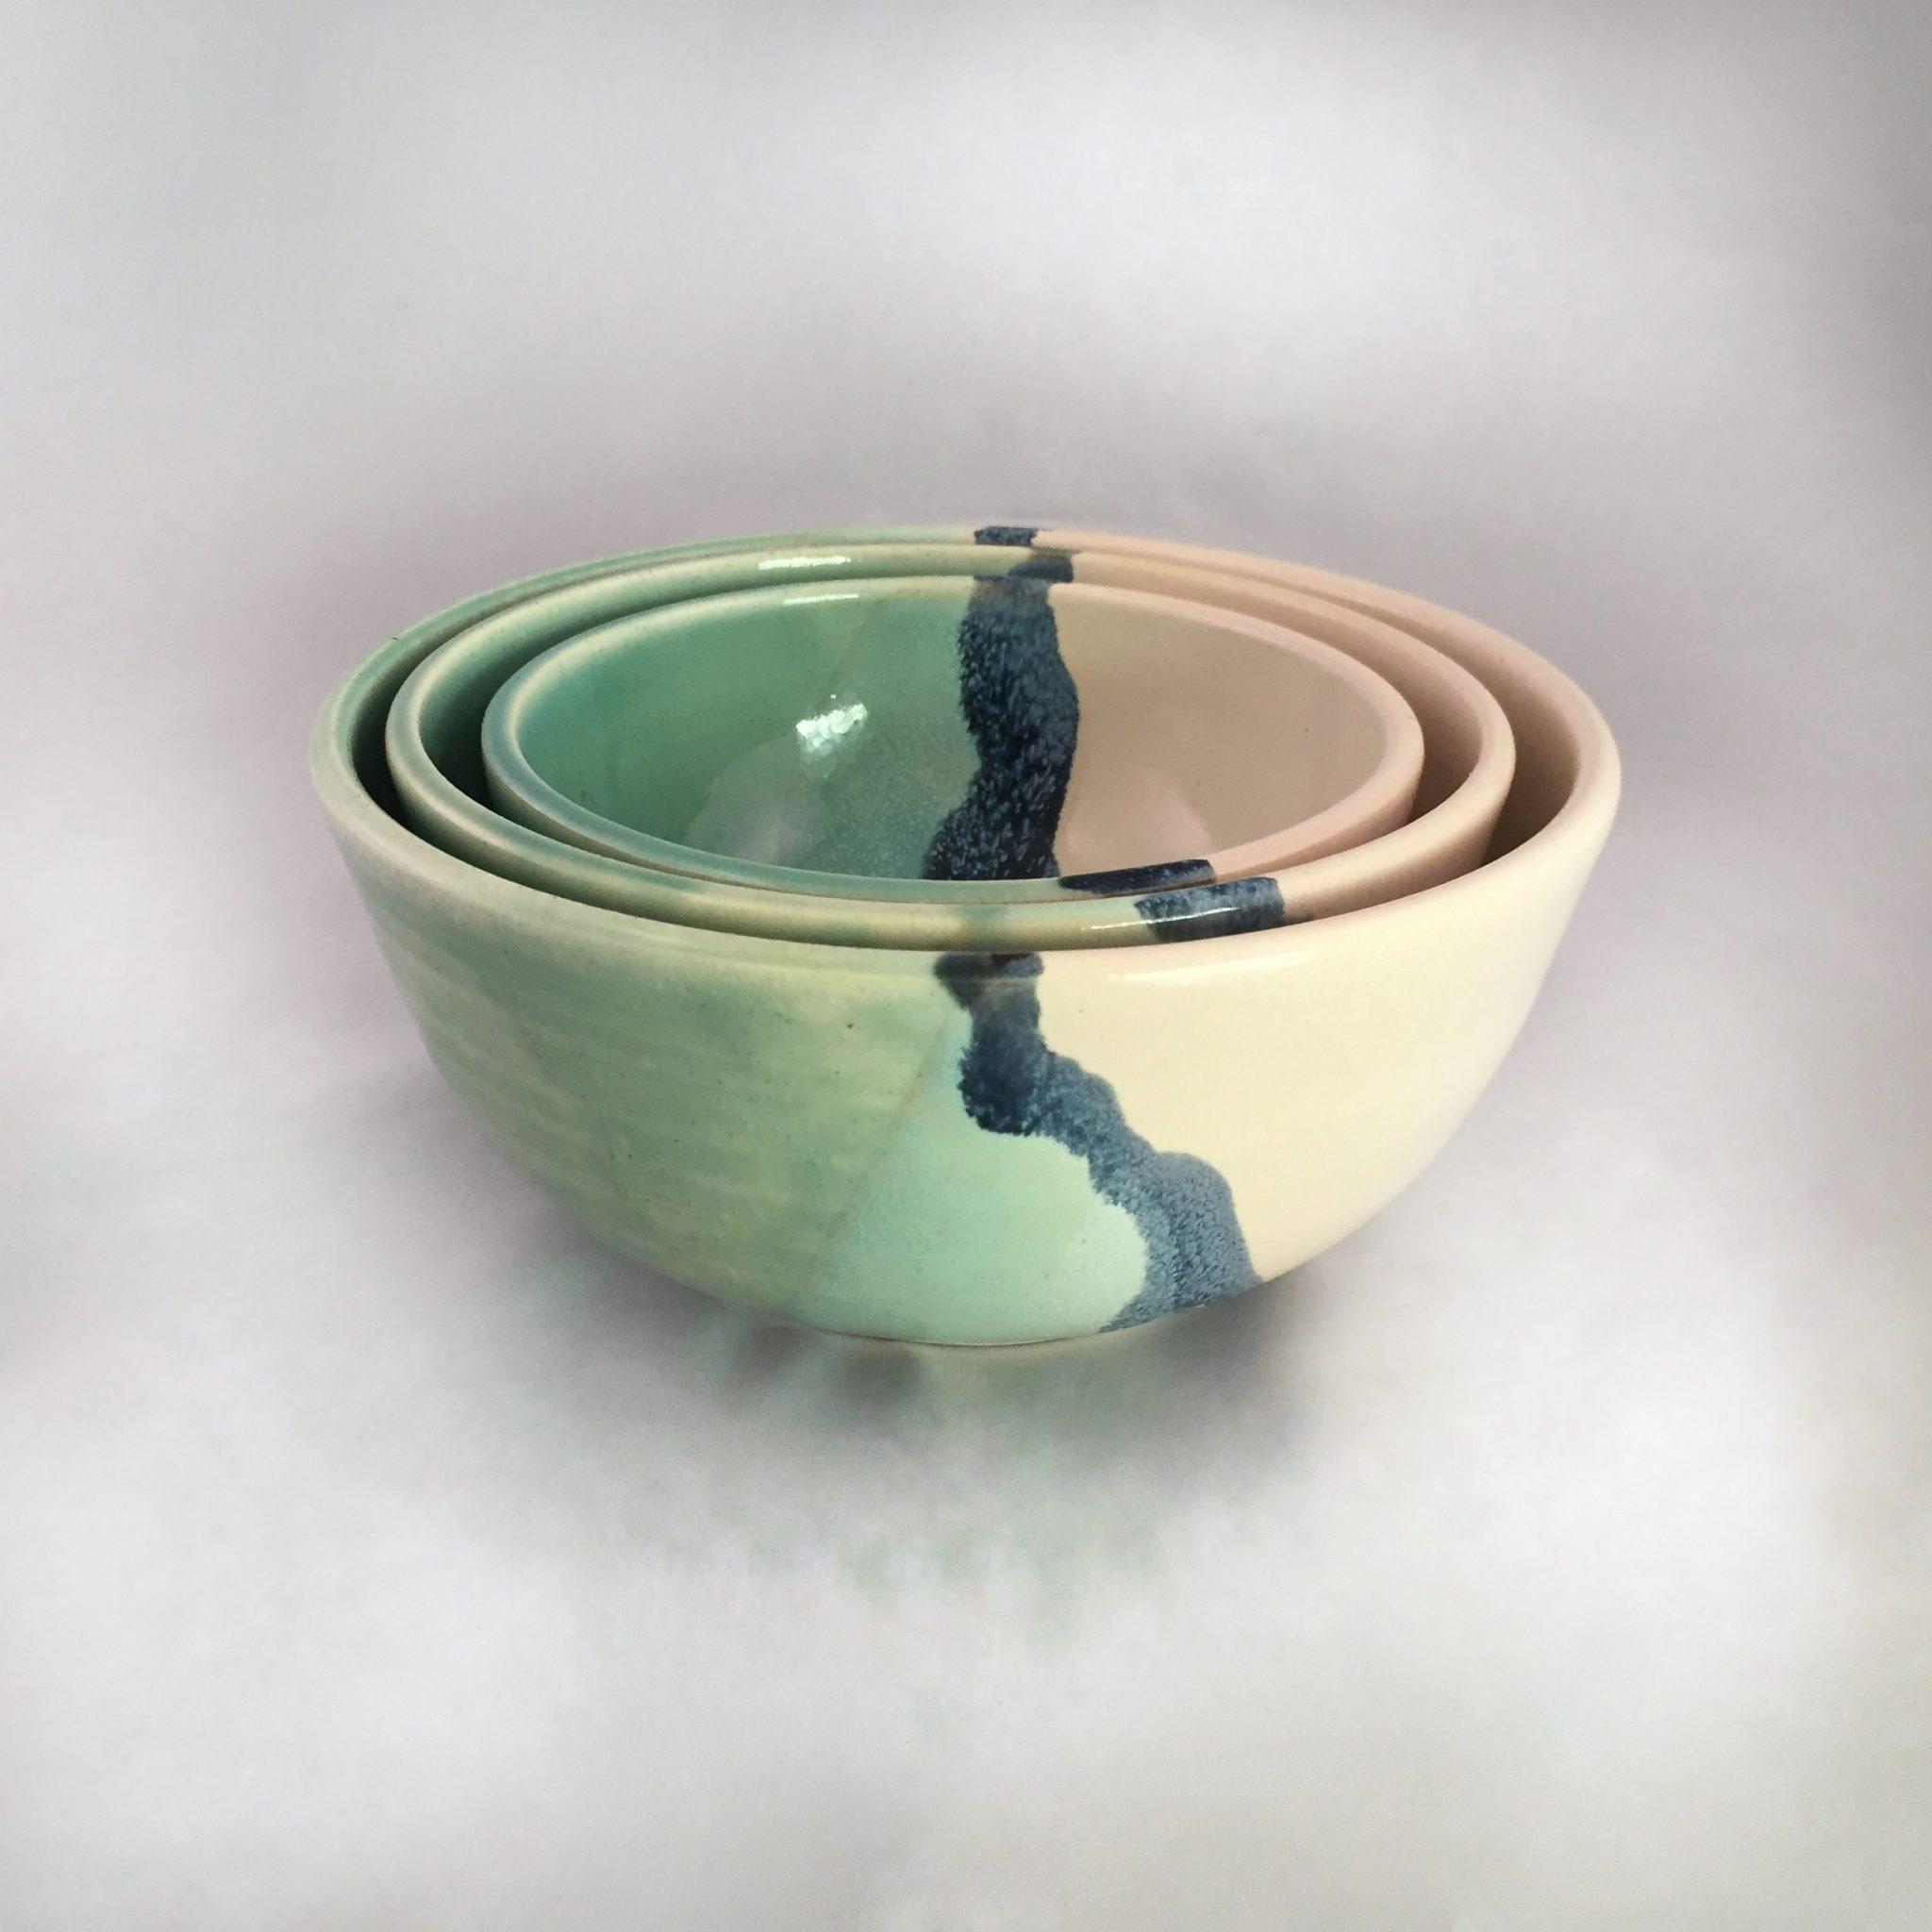 A green bowl